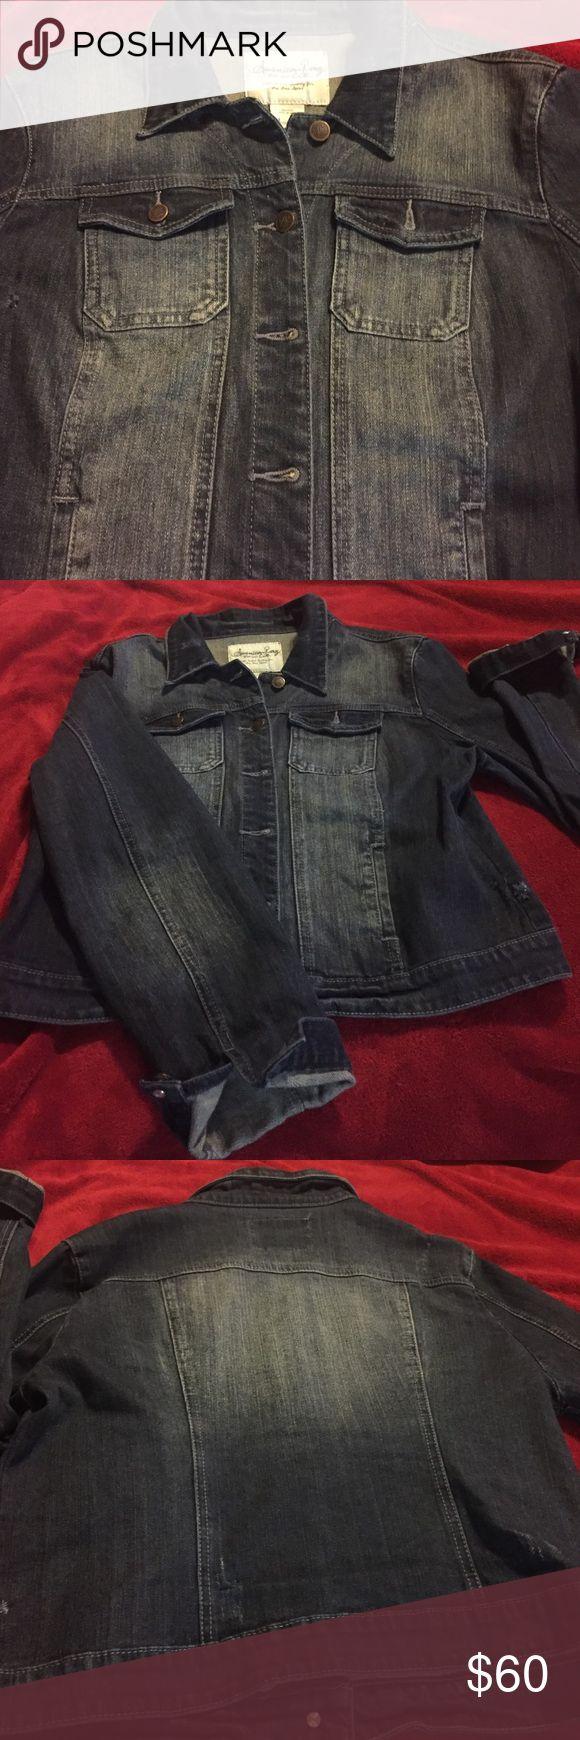 PRICE DROP American Rag Jacket Price Drop American Rag jean jacket wore twice. American Rag Jackets & Coats Jean Jackets